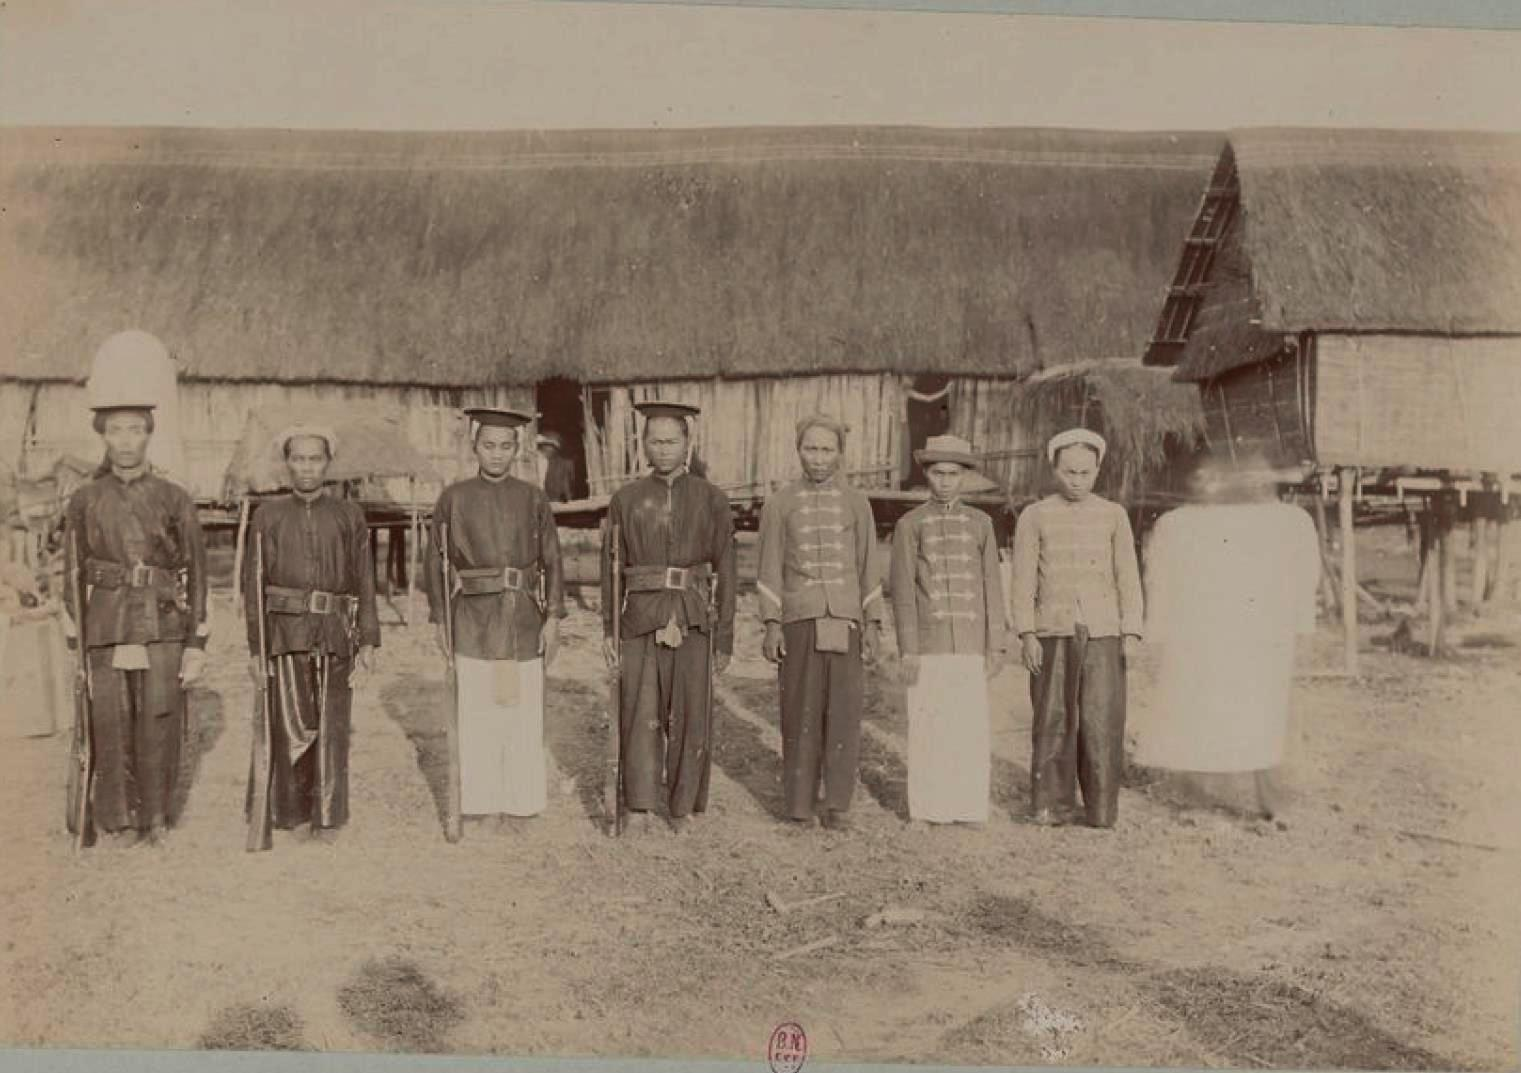 Милиционеры и слуги компании Attopeu Mines